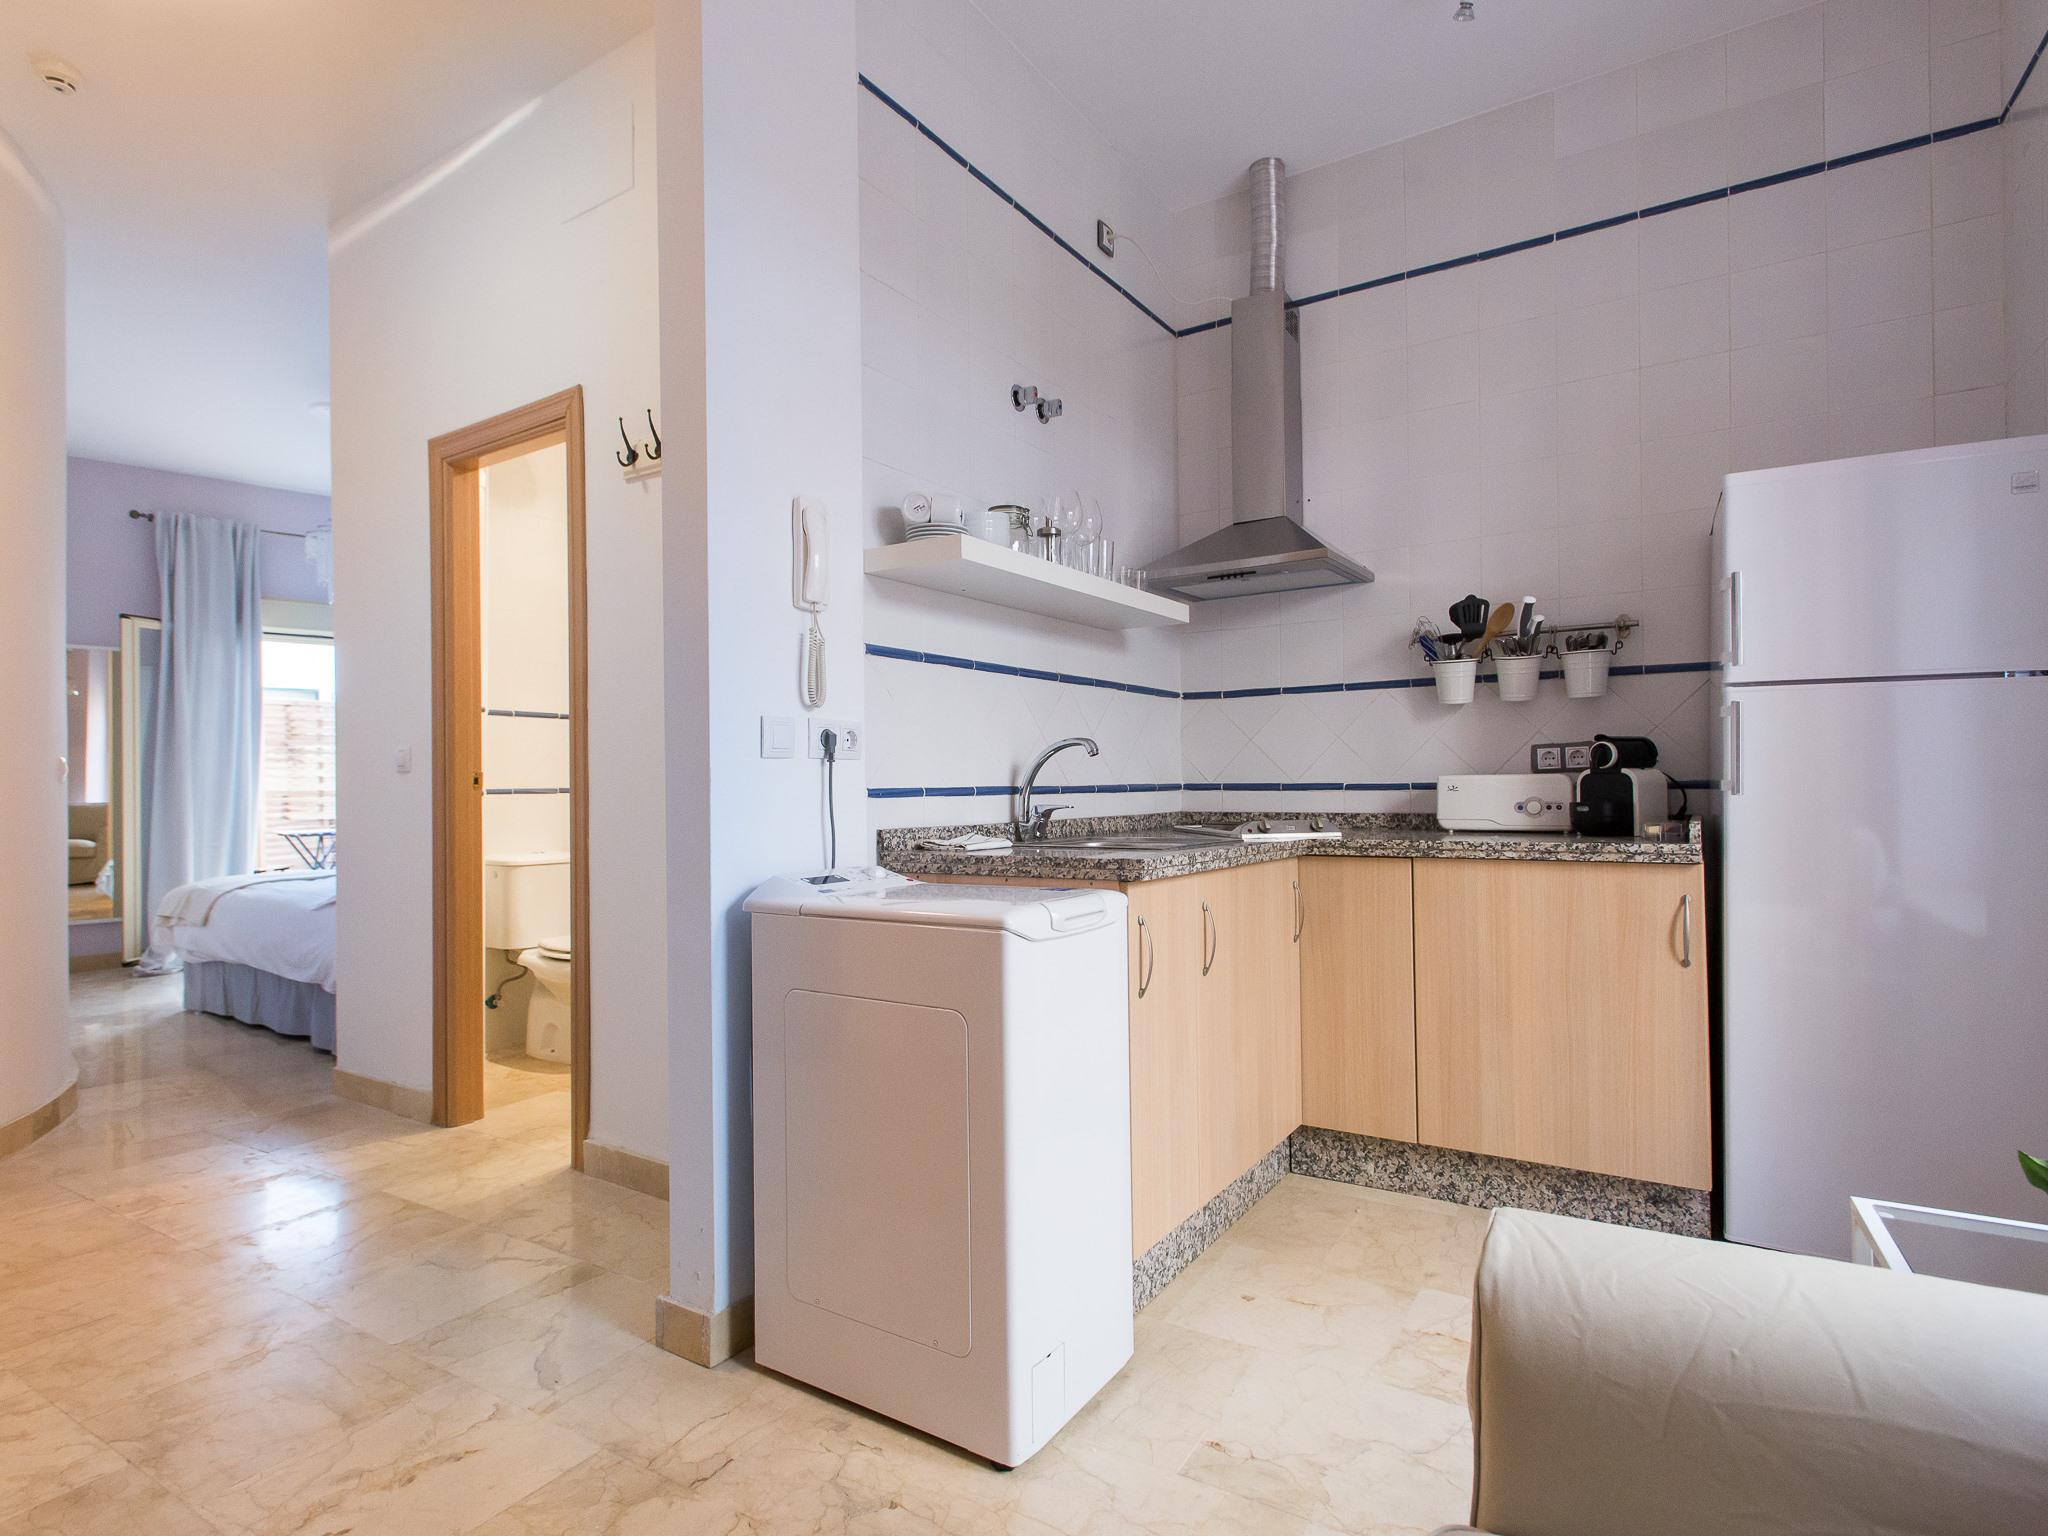 Apartamento-0A STUDIO CON PATIO 2 PAX-Estándar-Baño con ducha - Tarifa Base